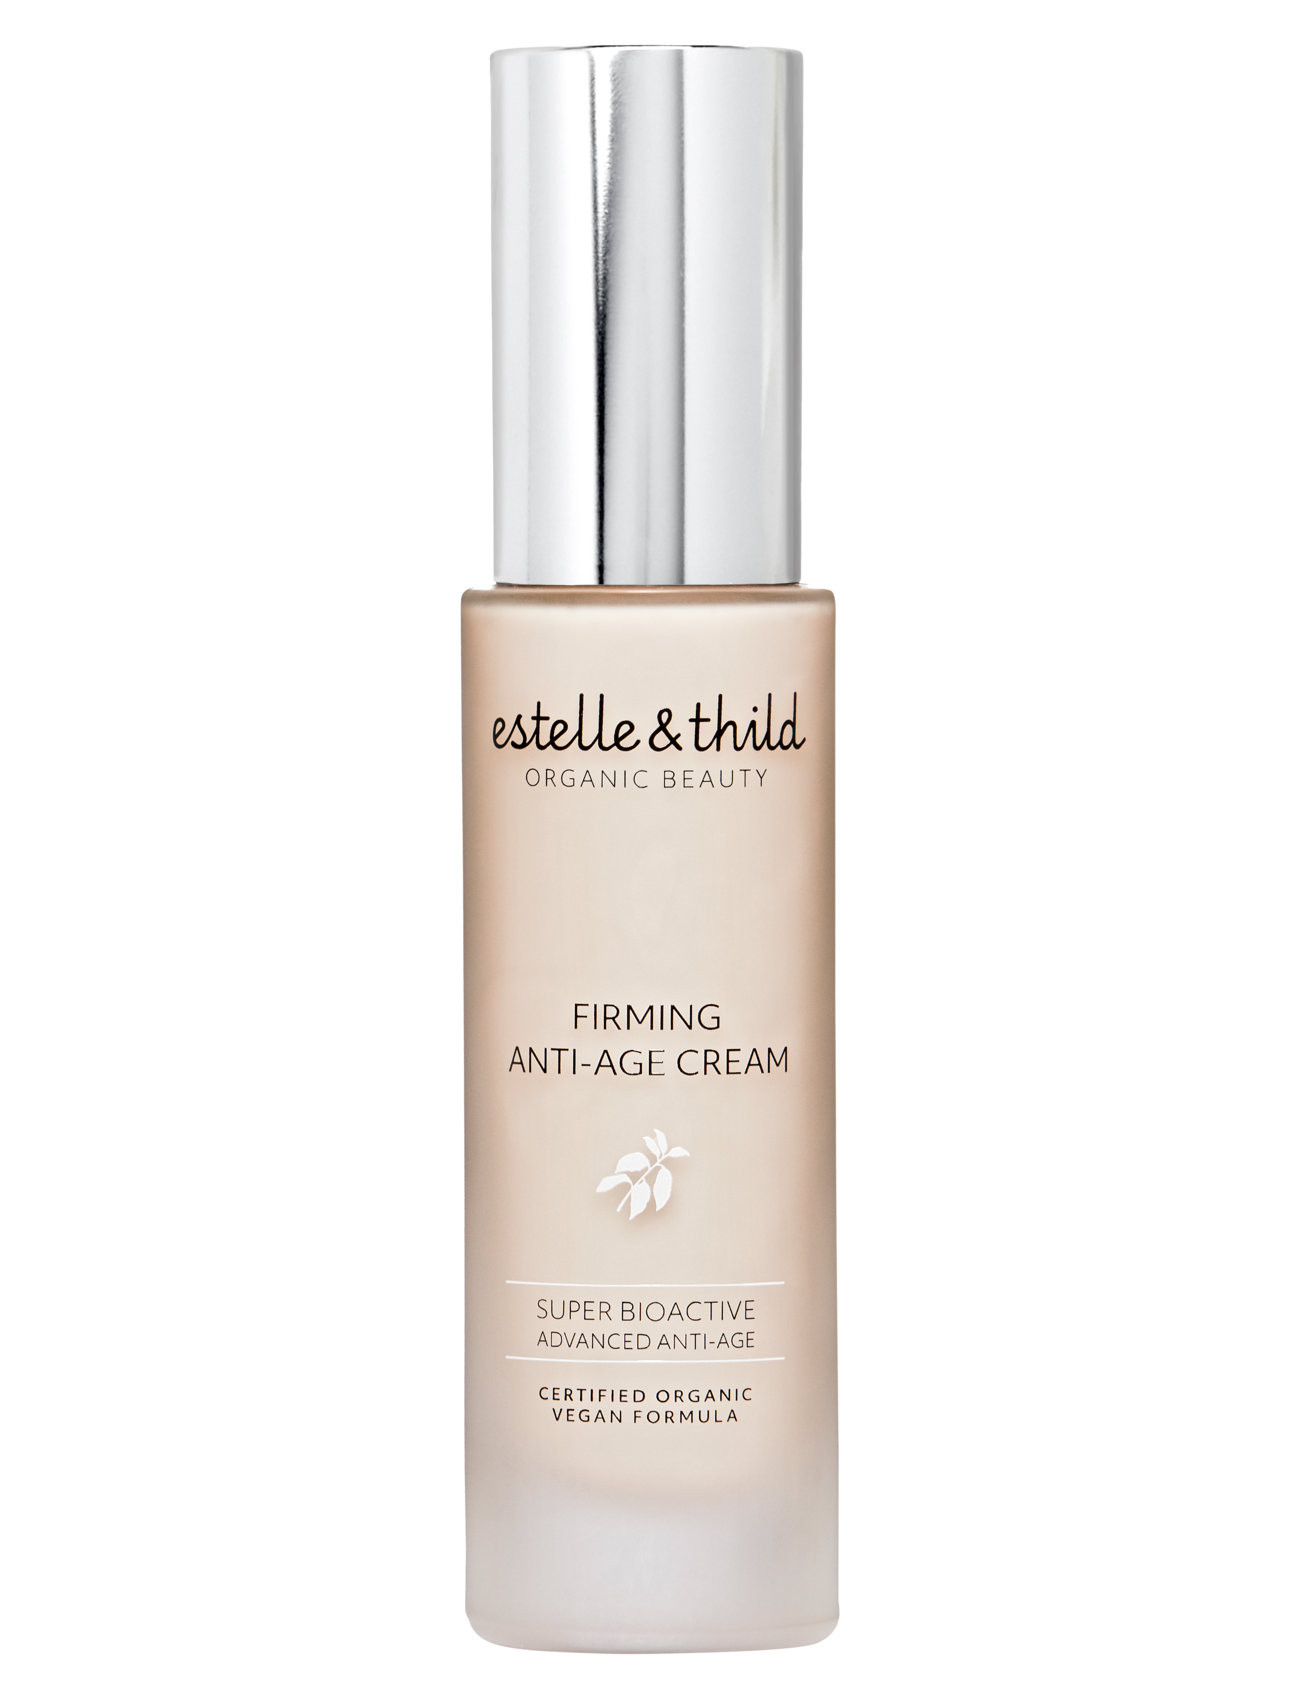 Super Bioactive  Firming Anti-Age Cream - Estelle & Thild